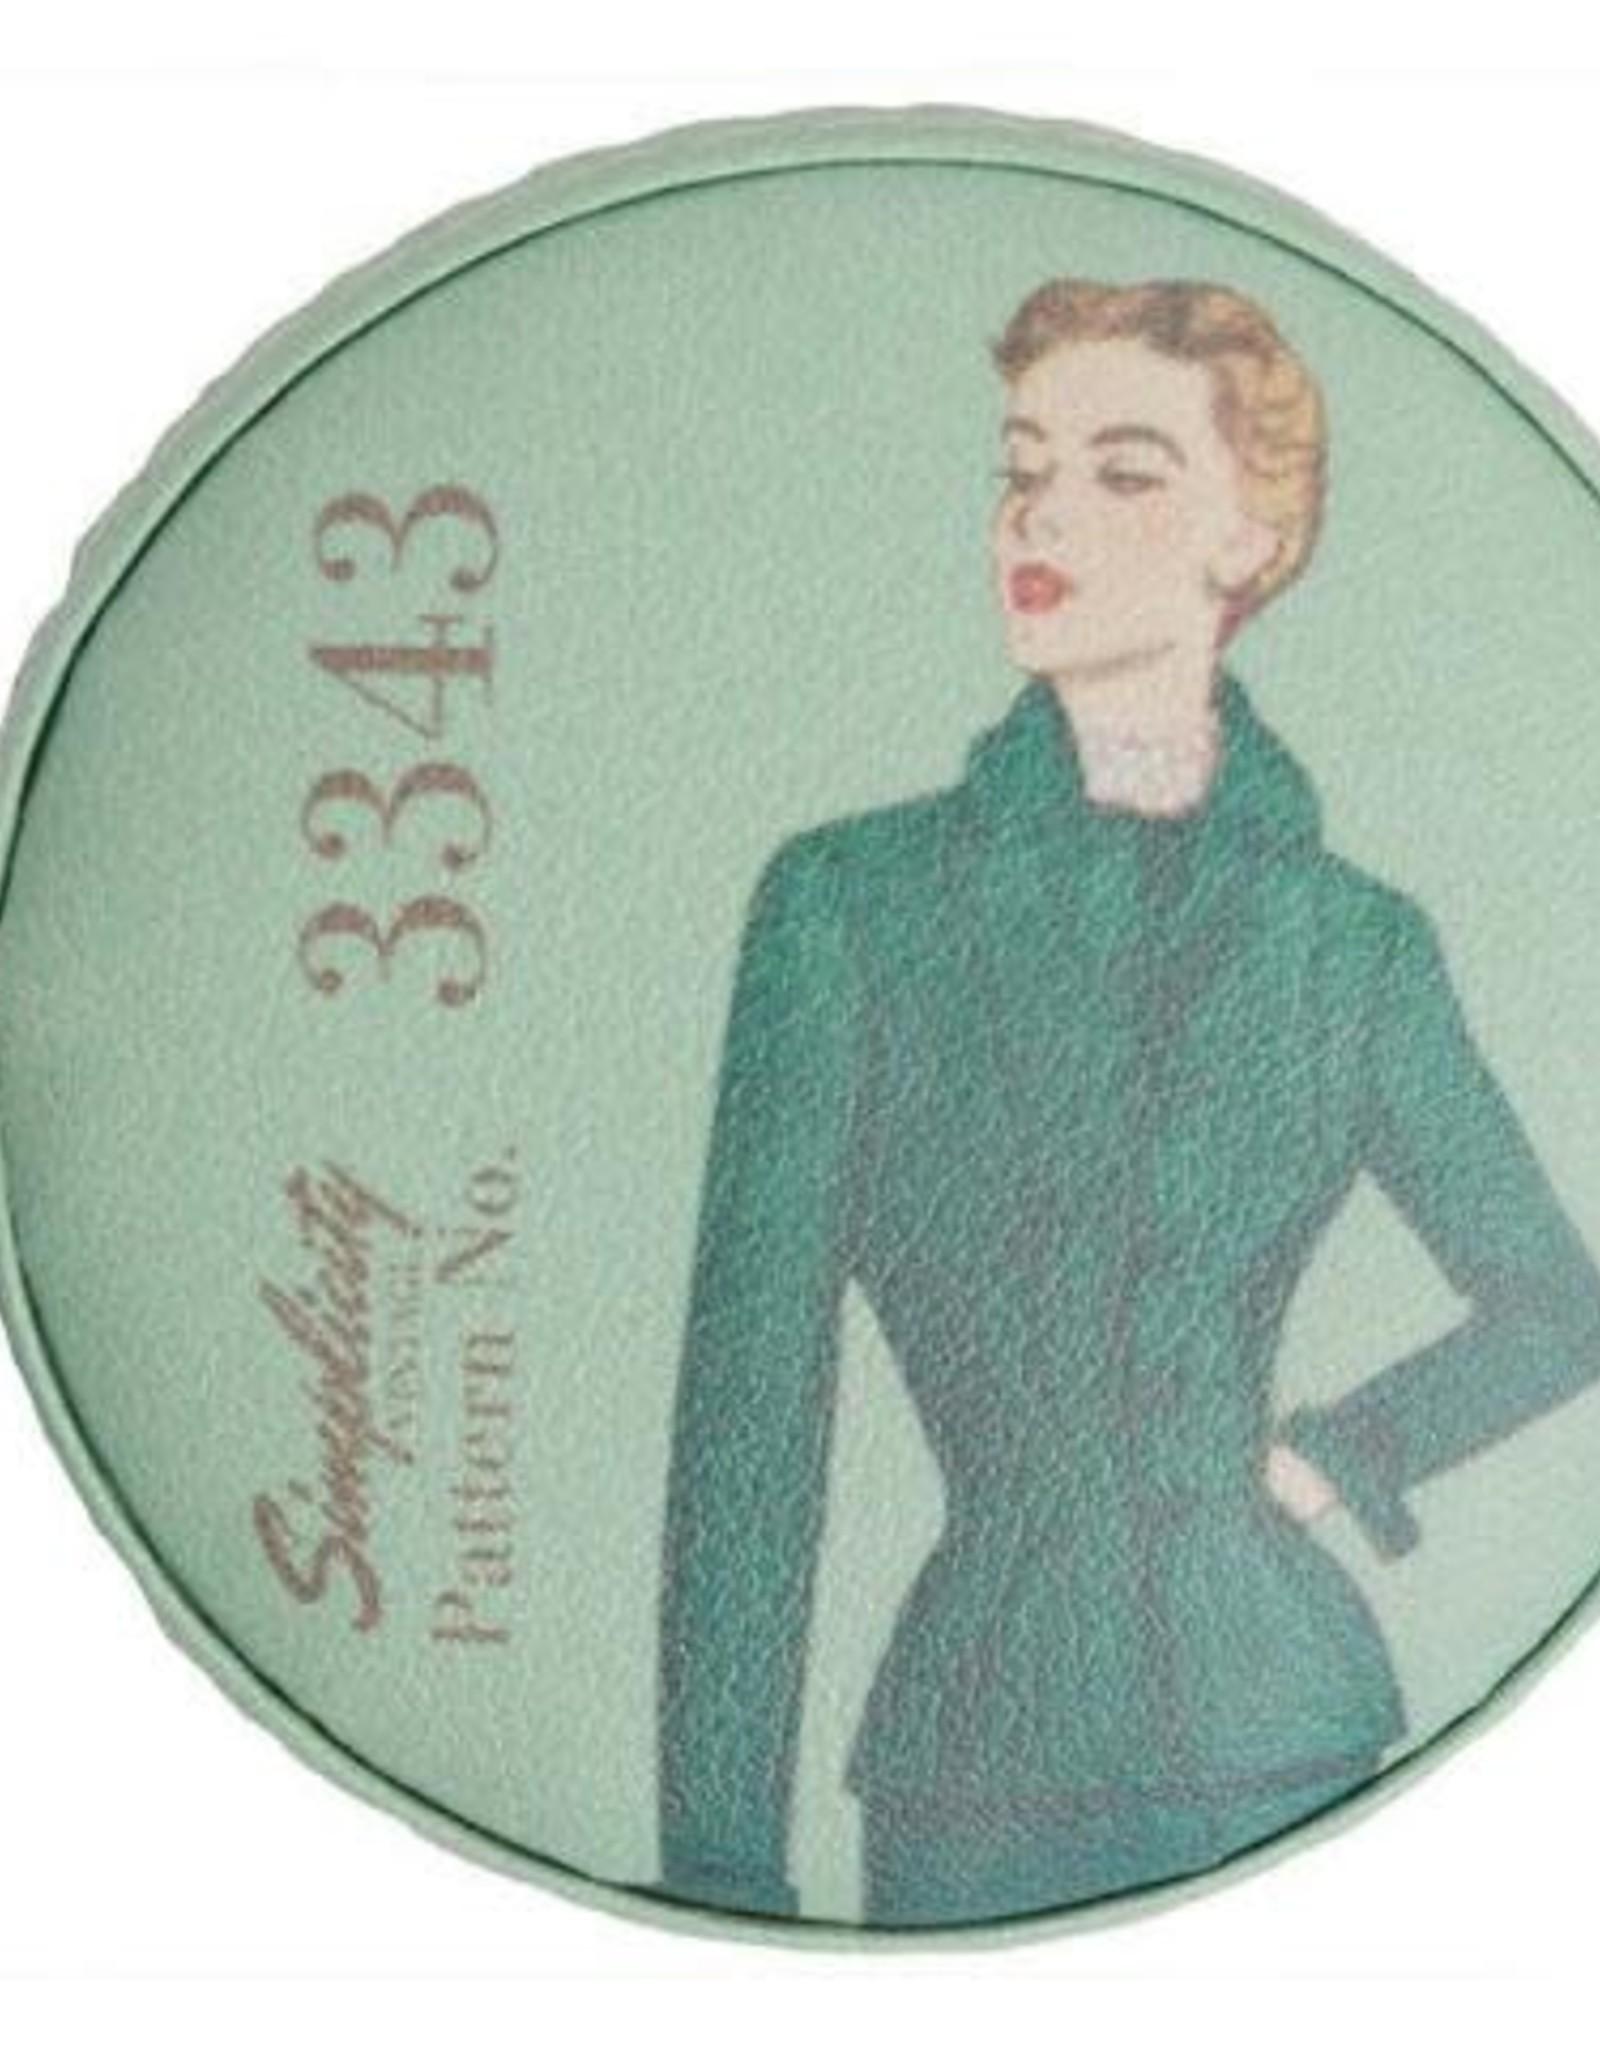 Vintage Measuring Tape: Various Designs